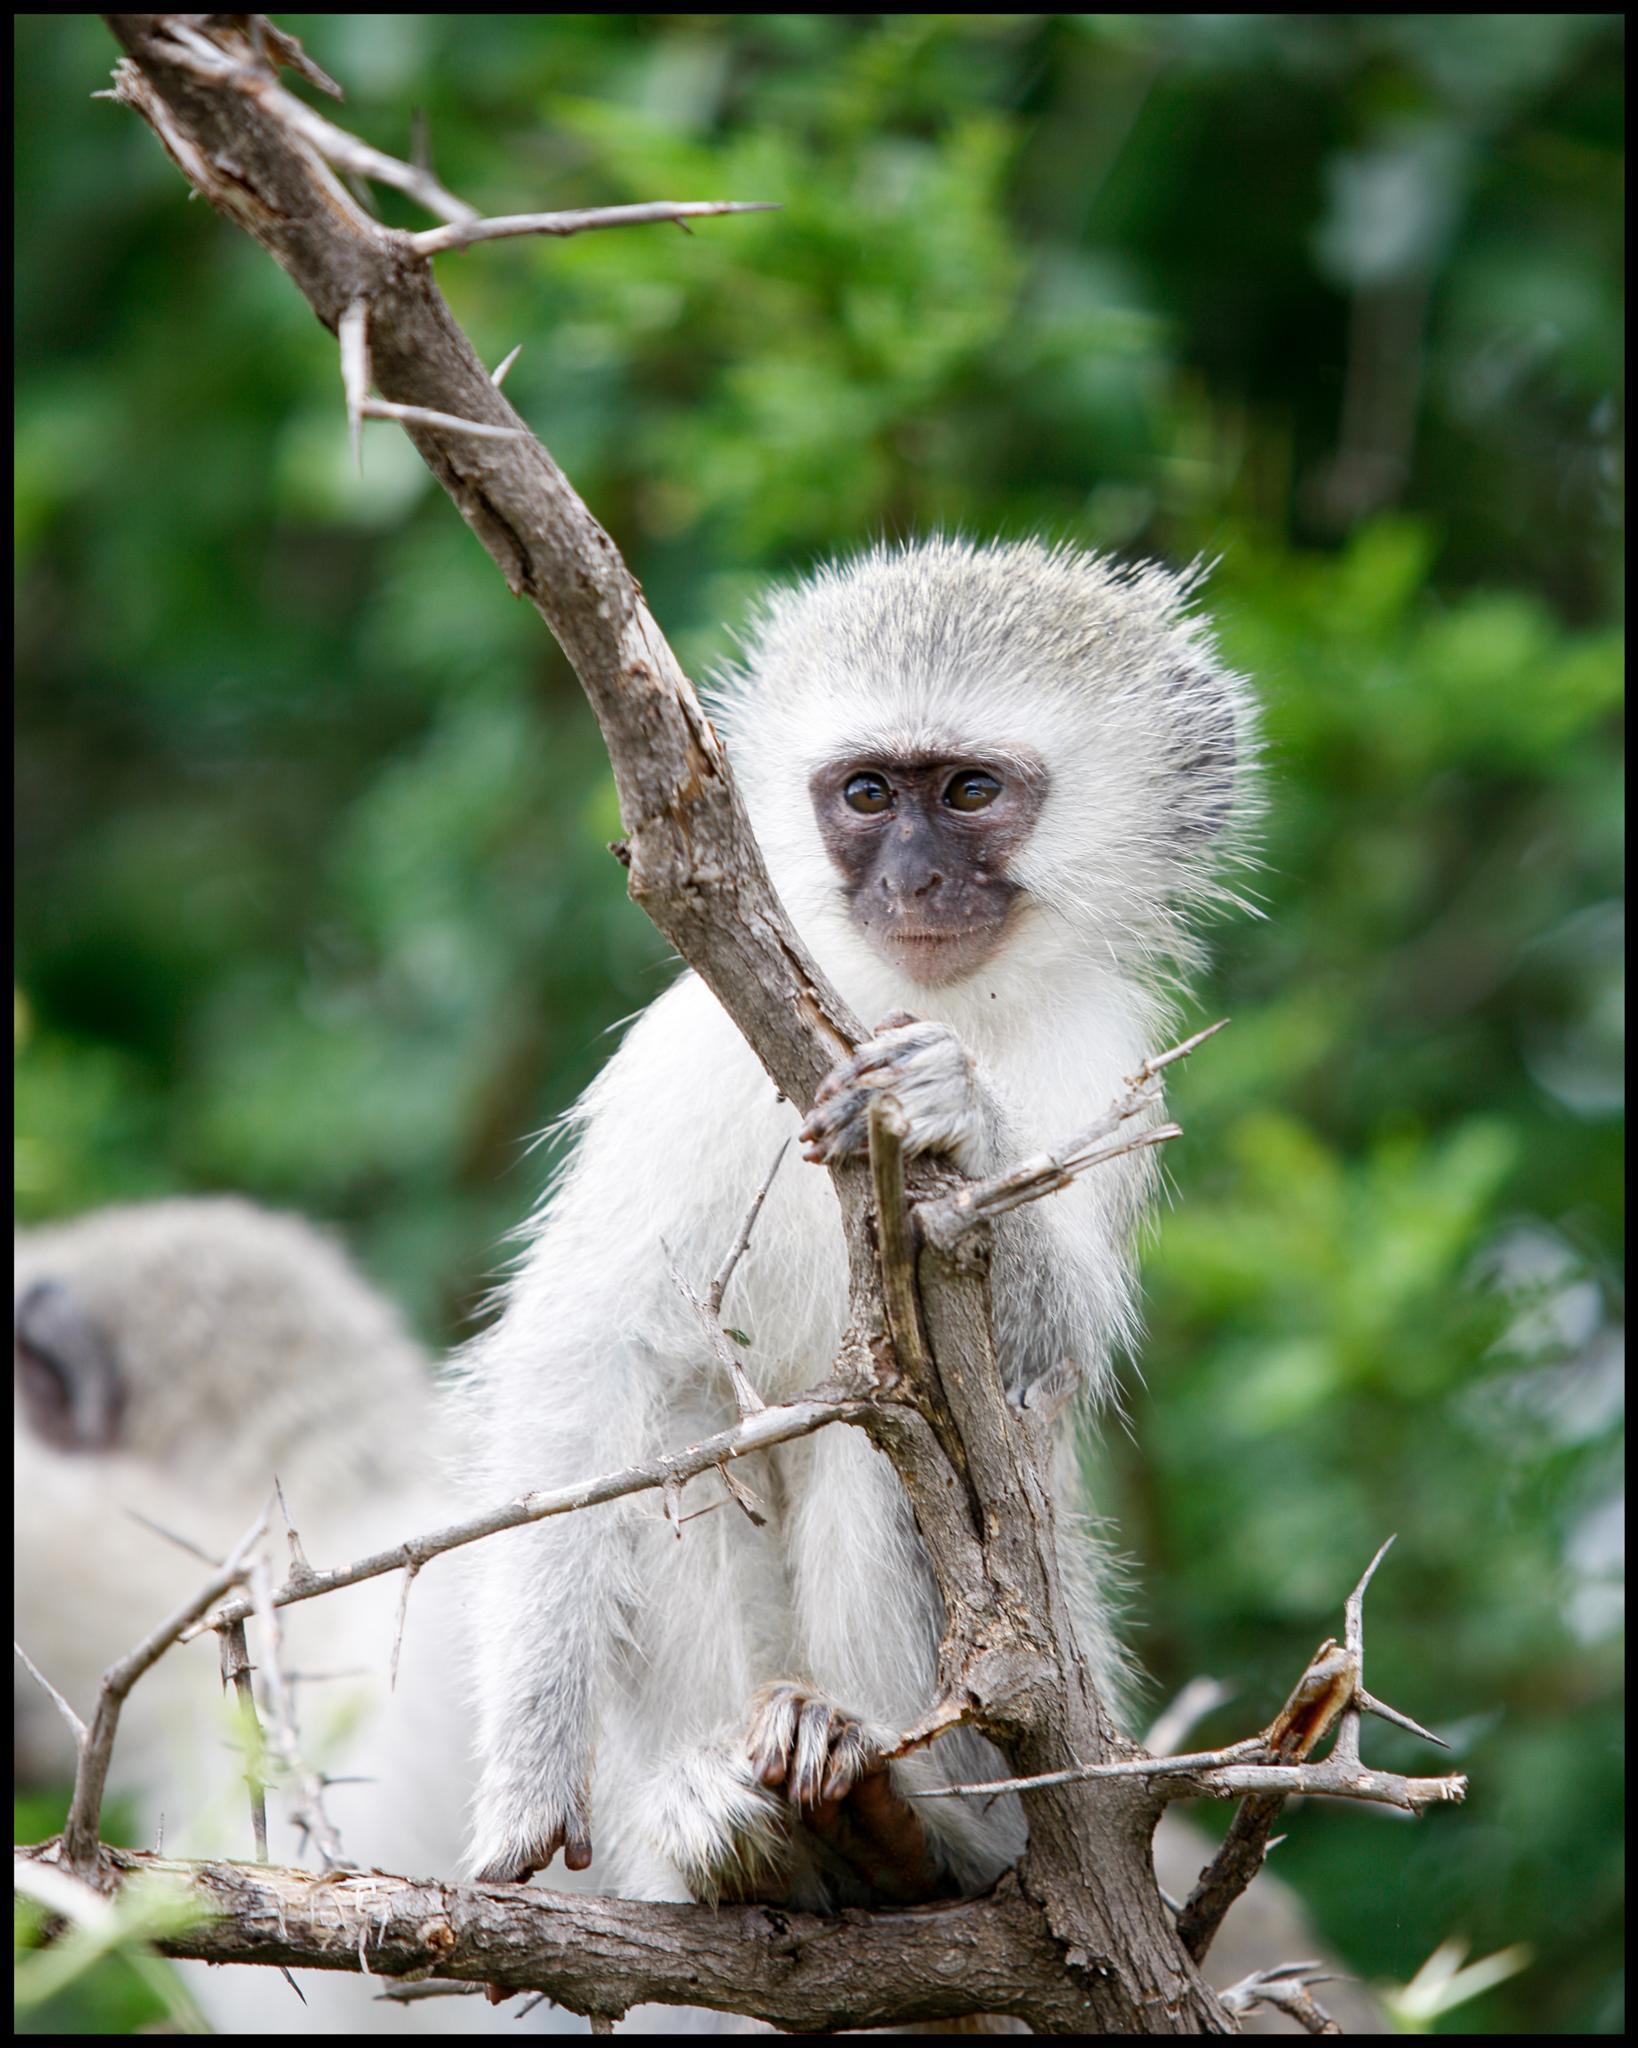 Junior Vervet Monkey by PickledFrog